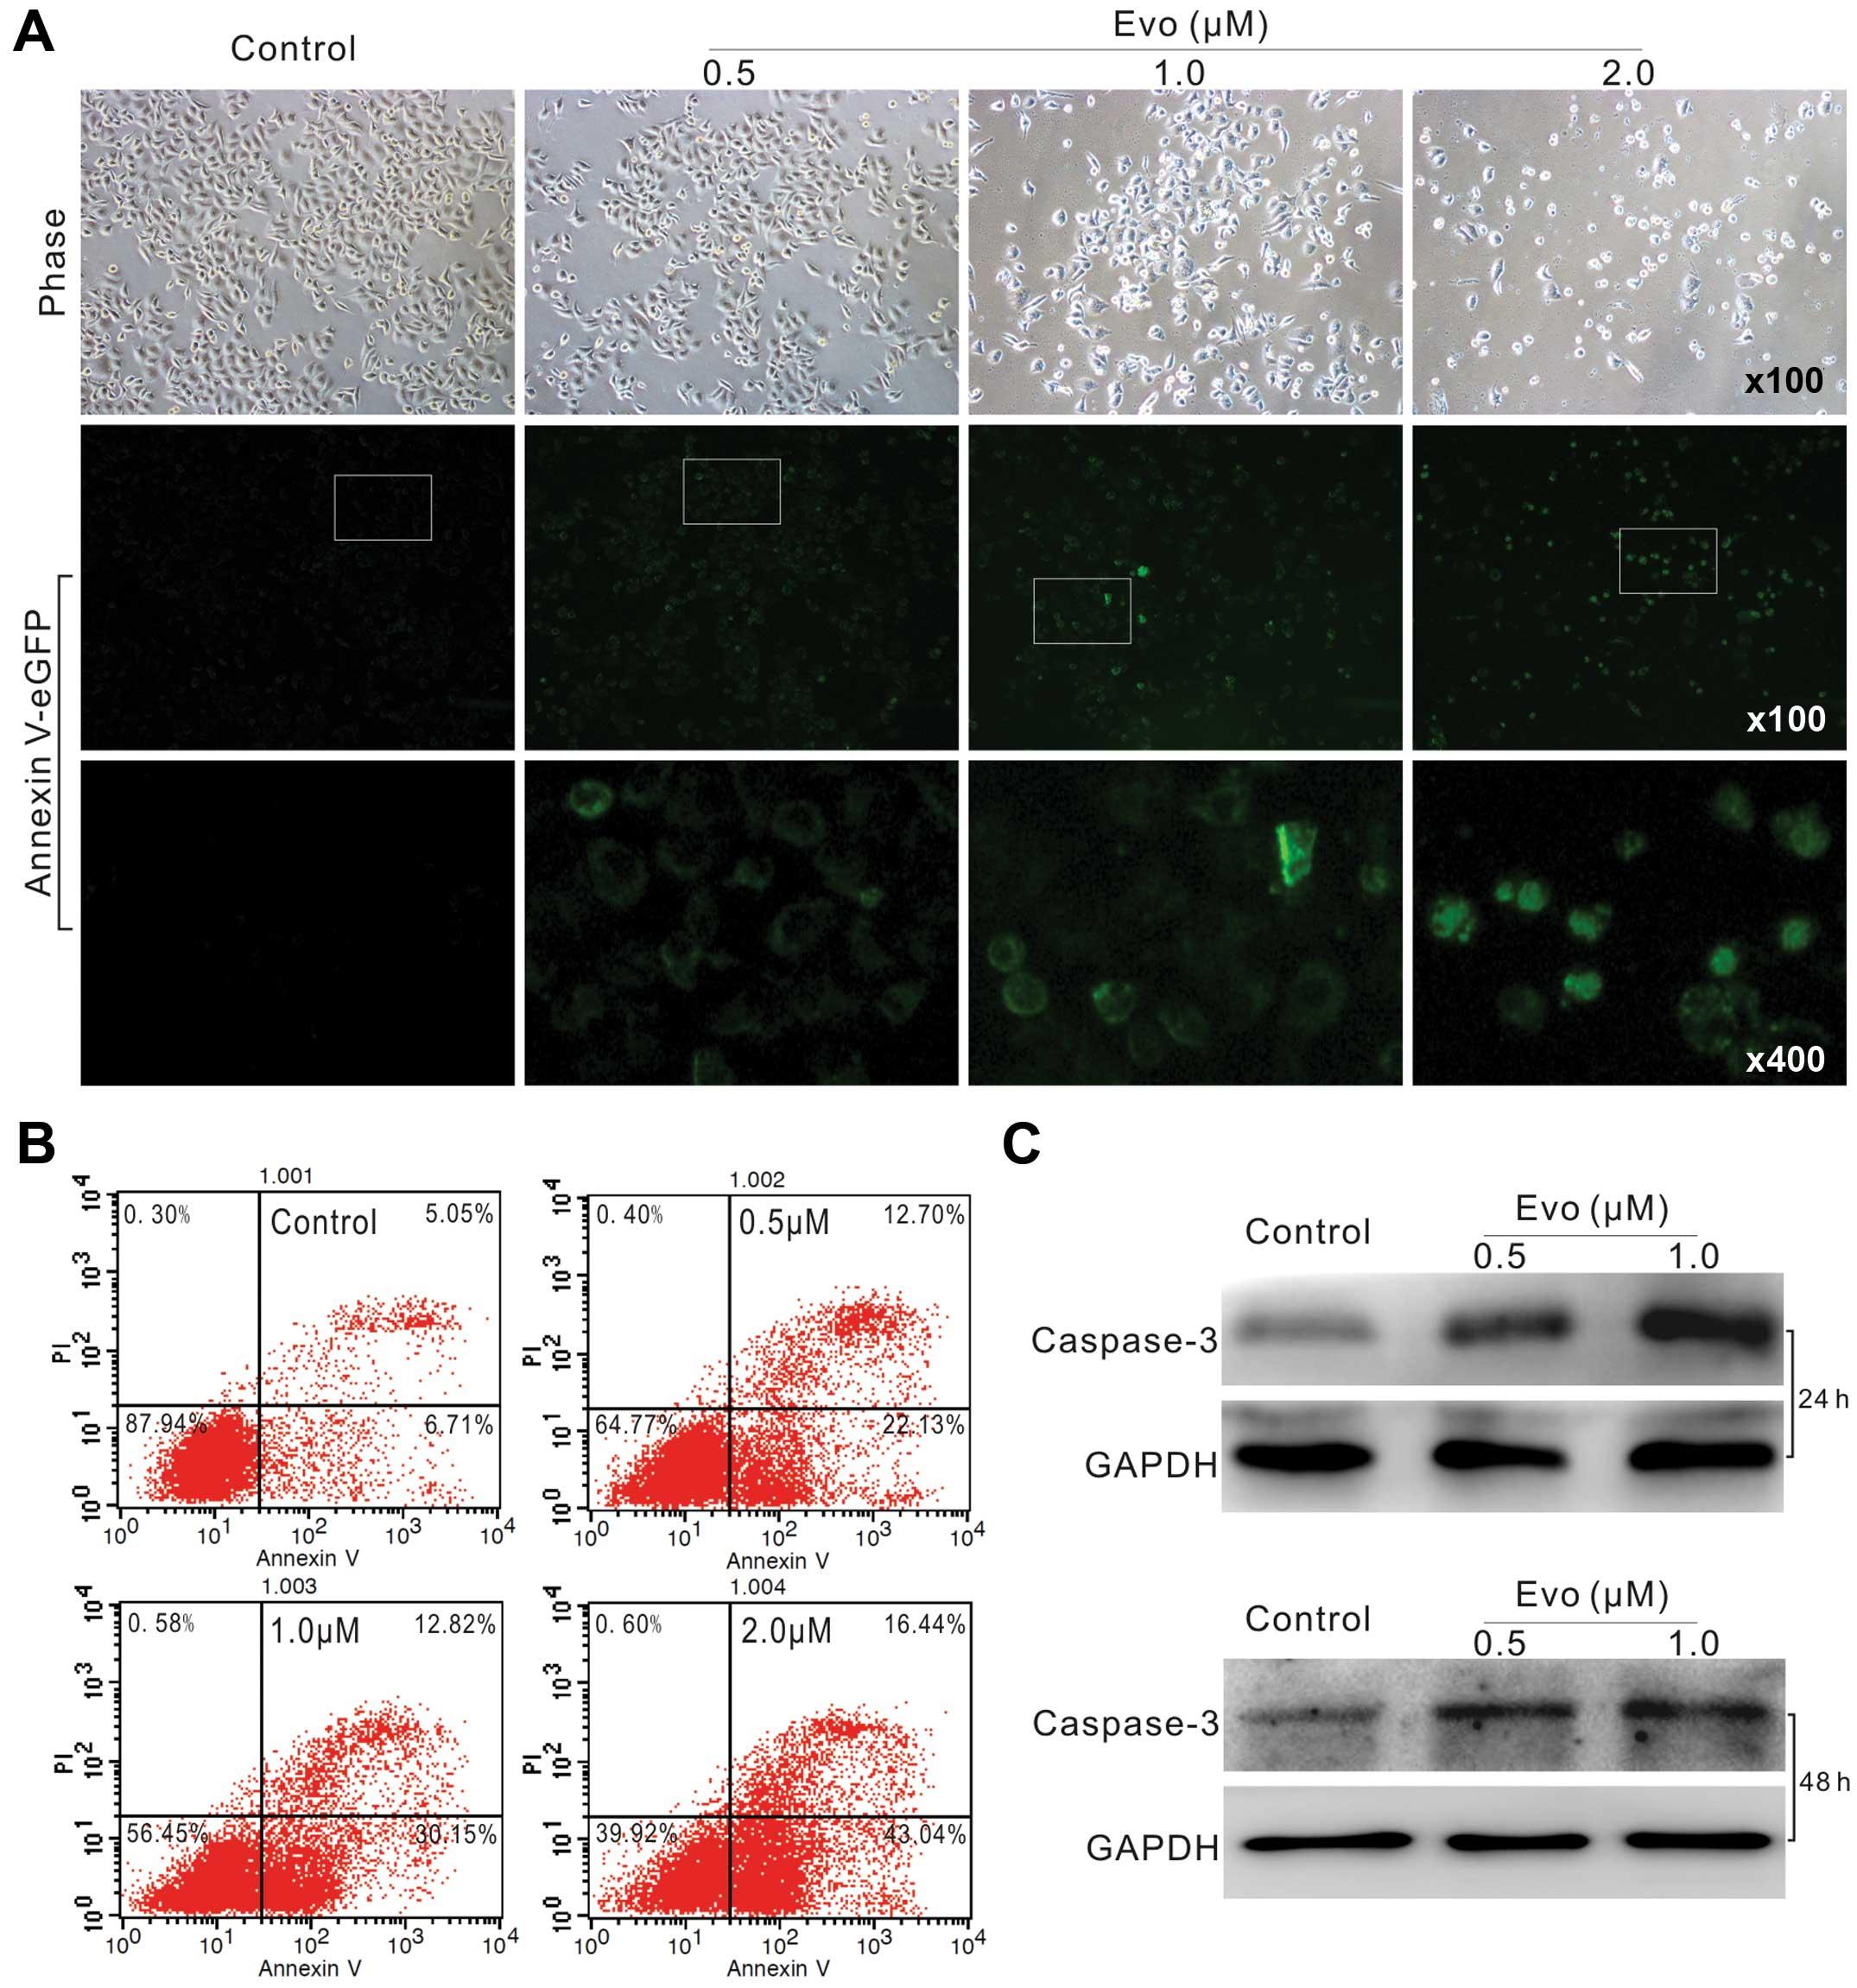 Antiproliferation effect of evodiamine in human colon